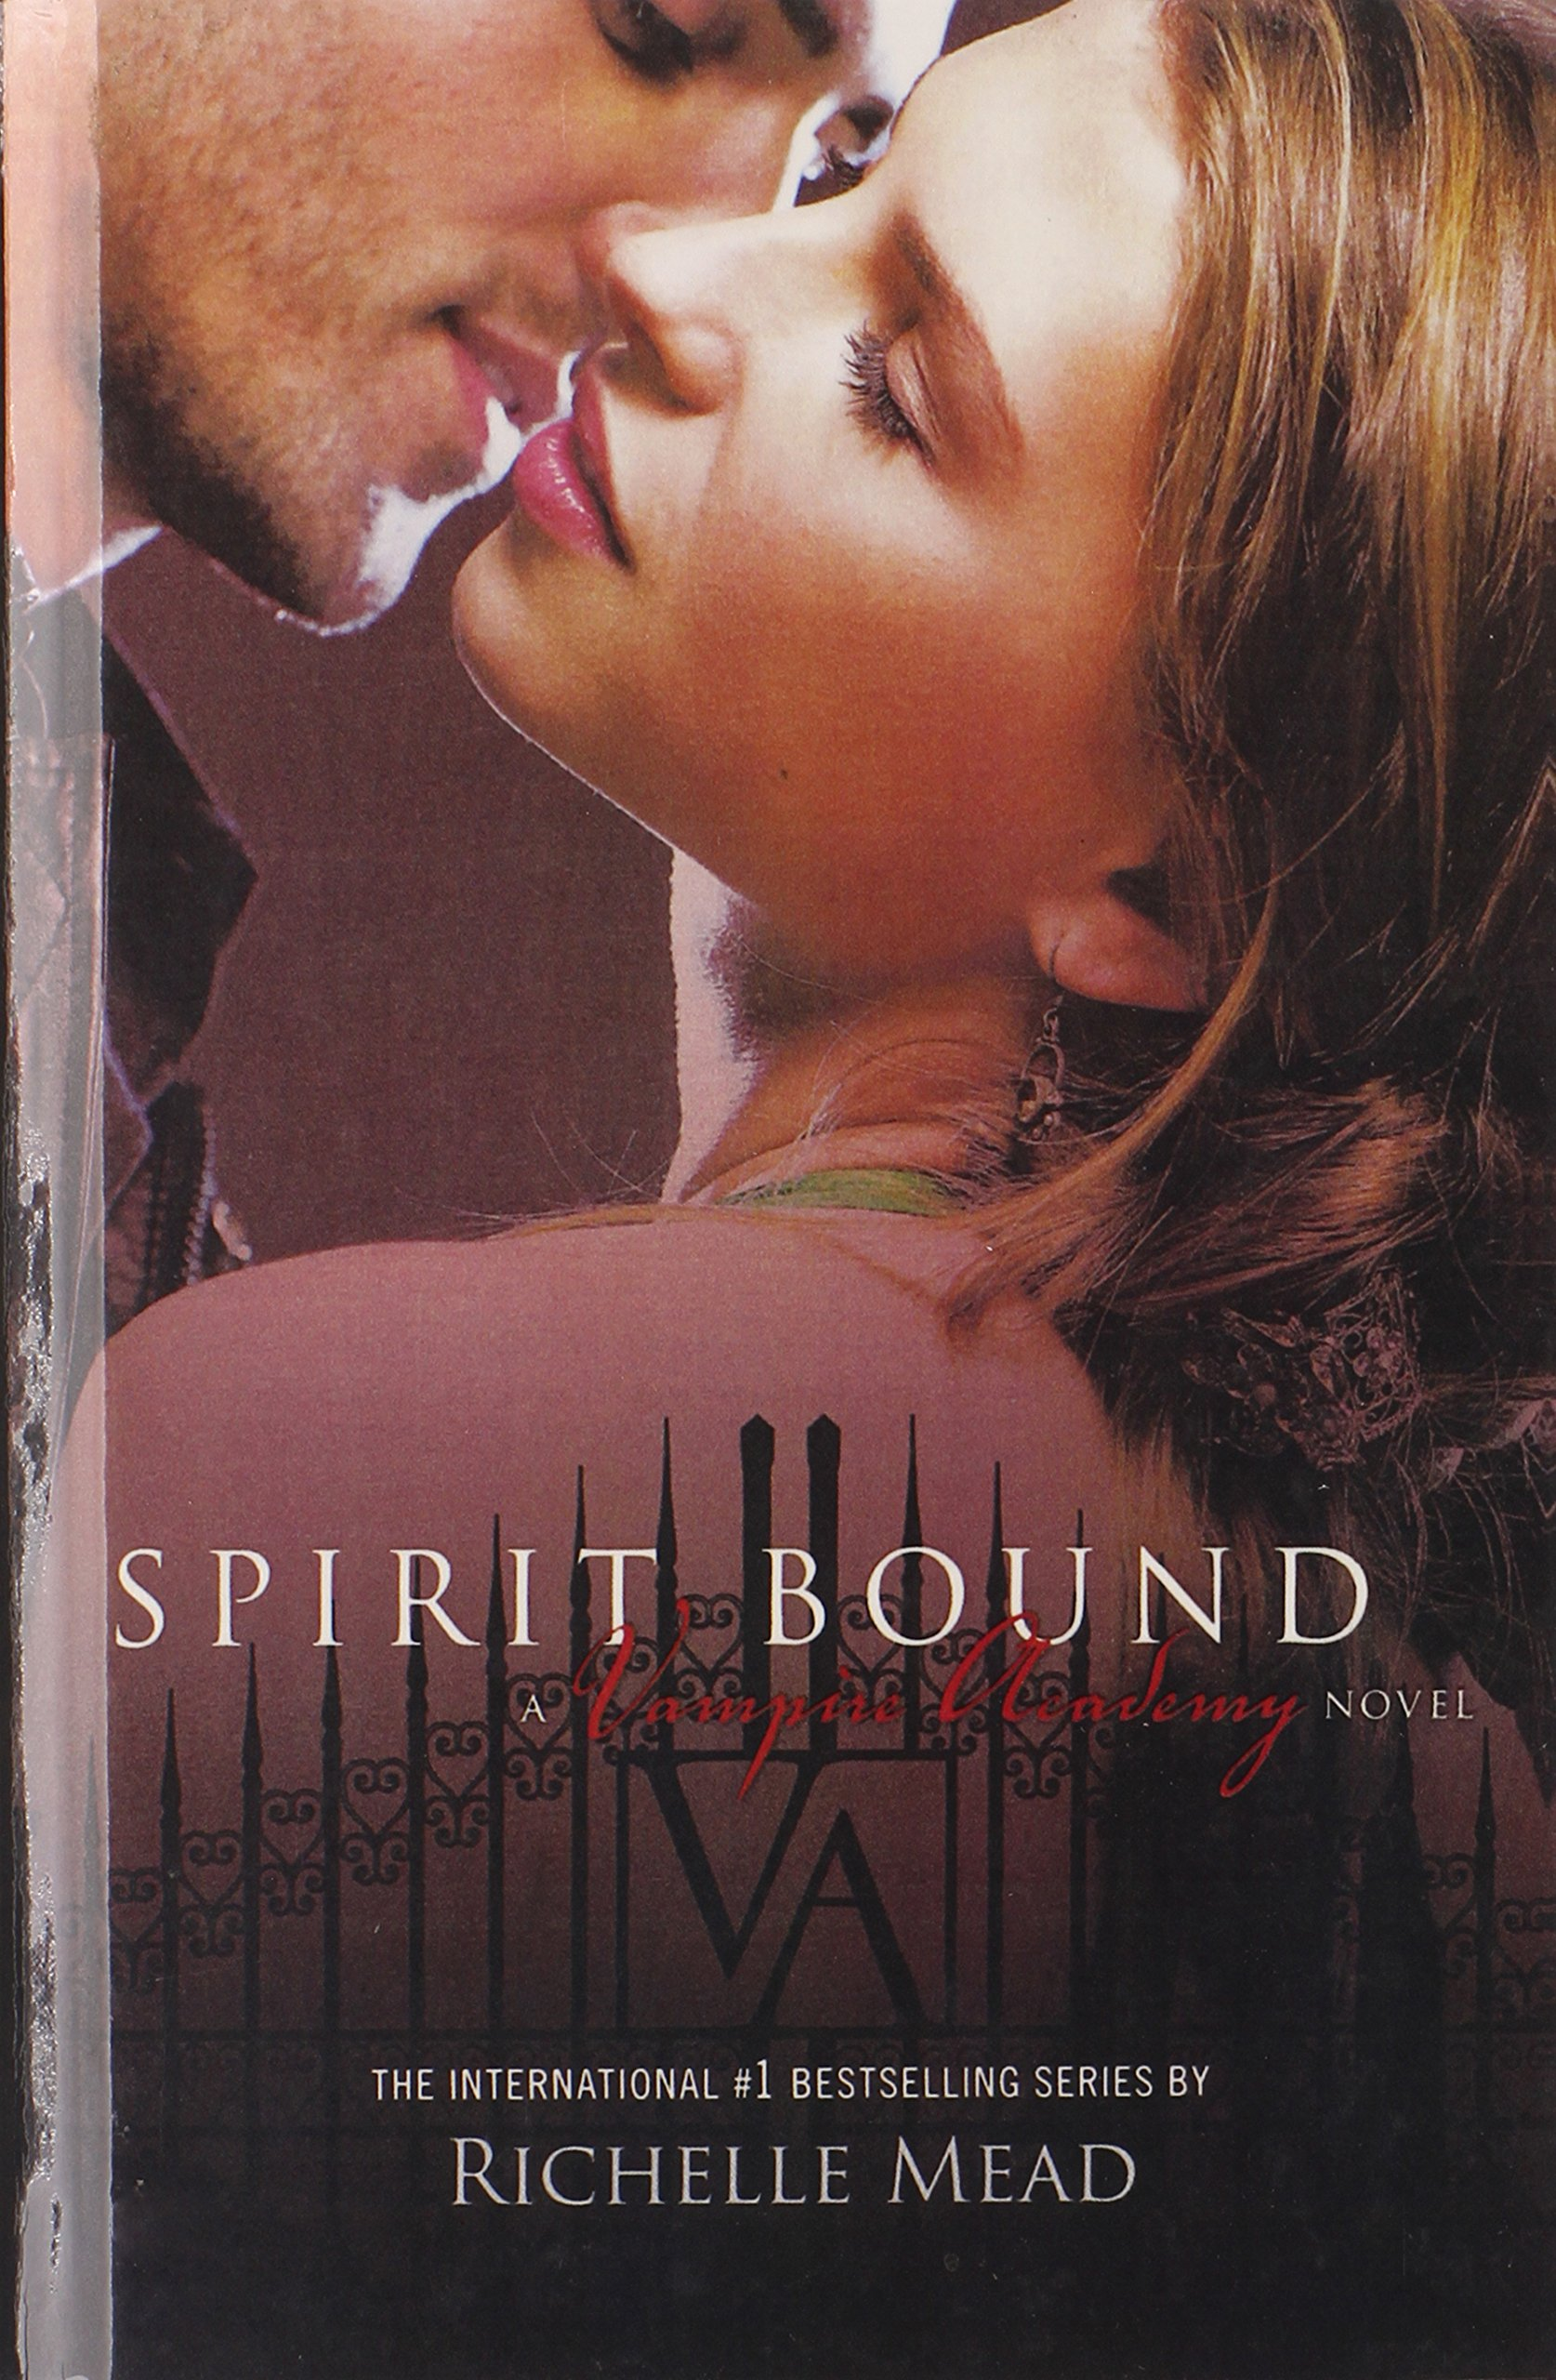 Read Online Spirit Bound (Turtleback School & Library Binding Edition) (Vampire Academy) PDF